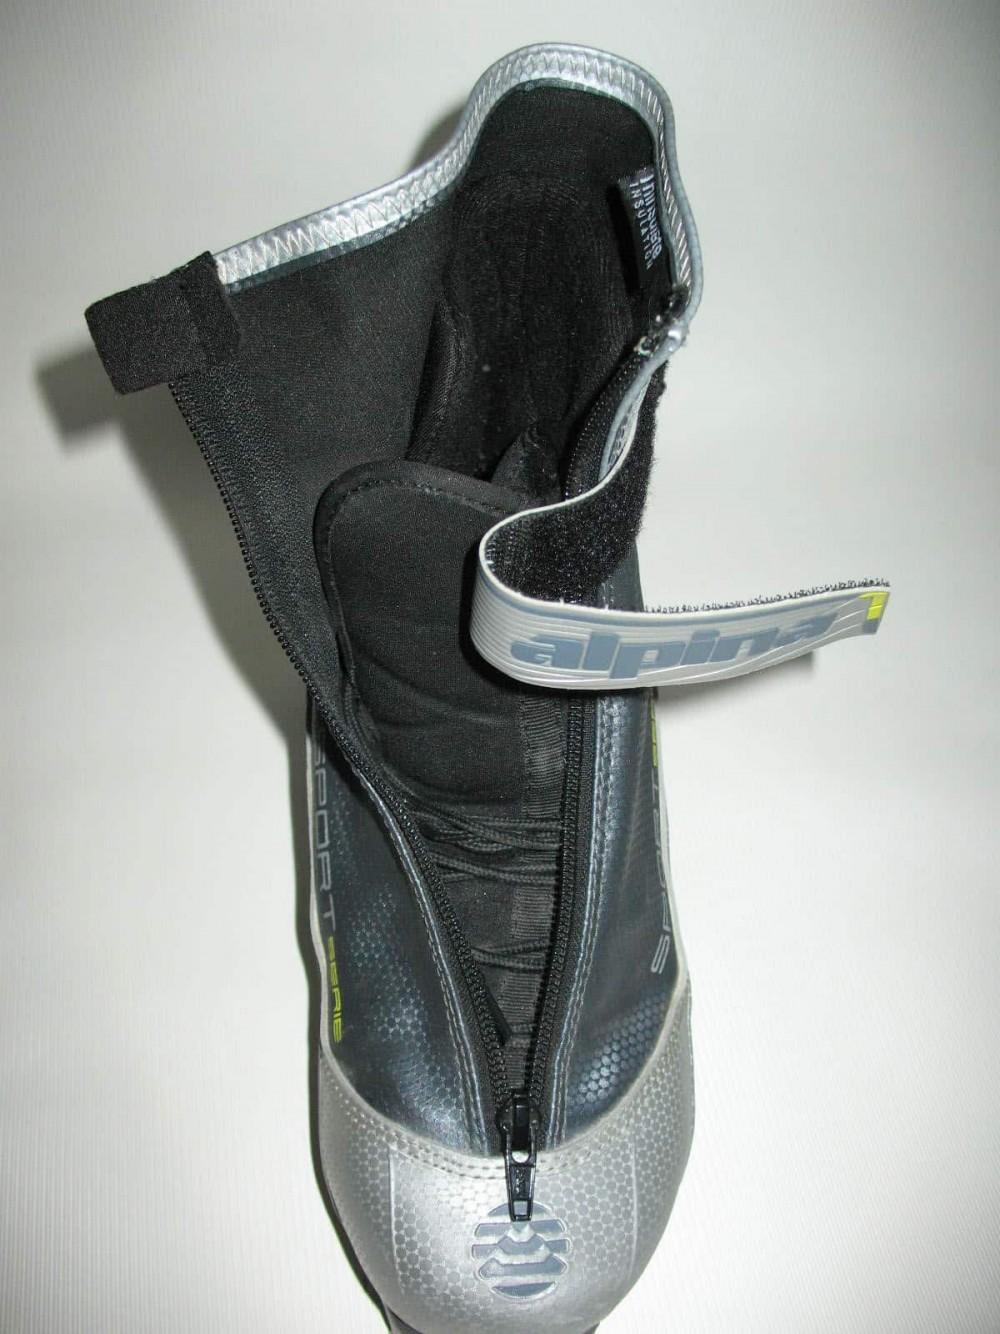 Ботинки ALPINA sr40 cross country ski boots (размер EU41(на стопу до 255 mm)) - 11